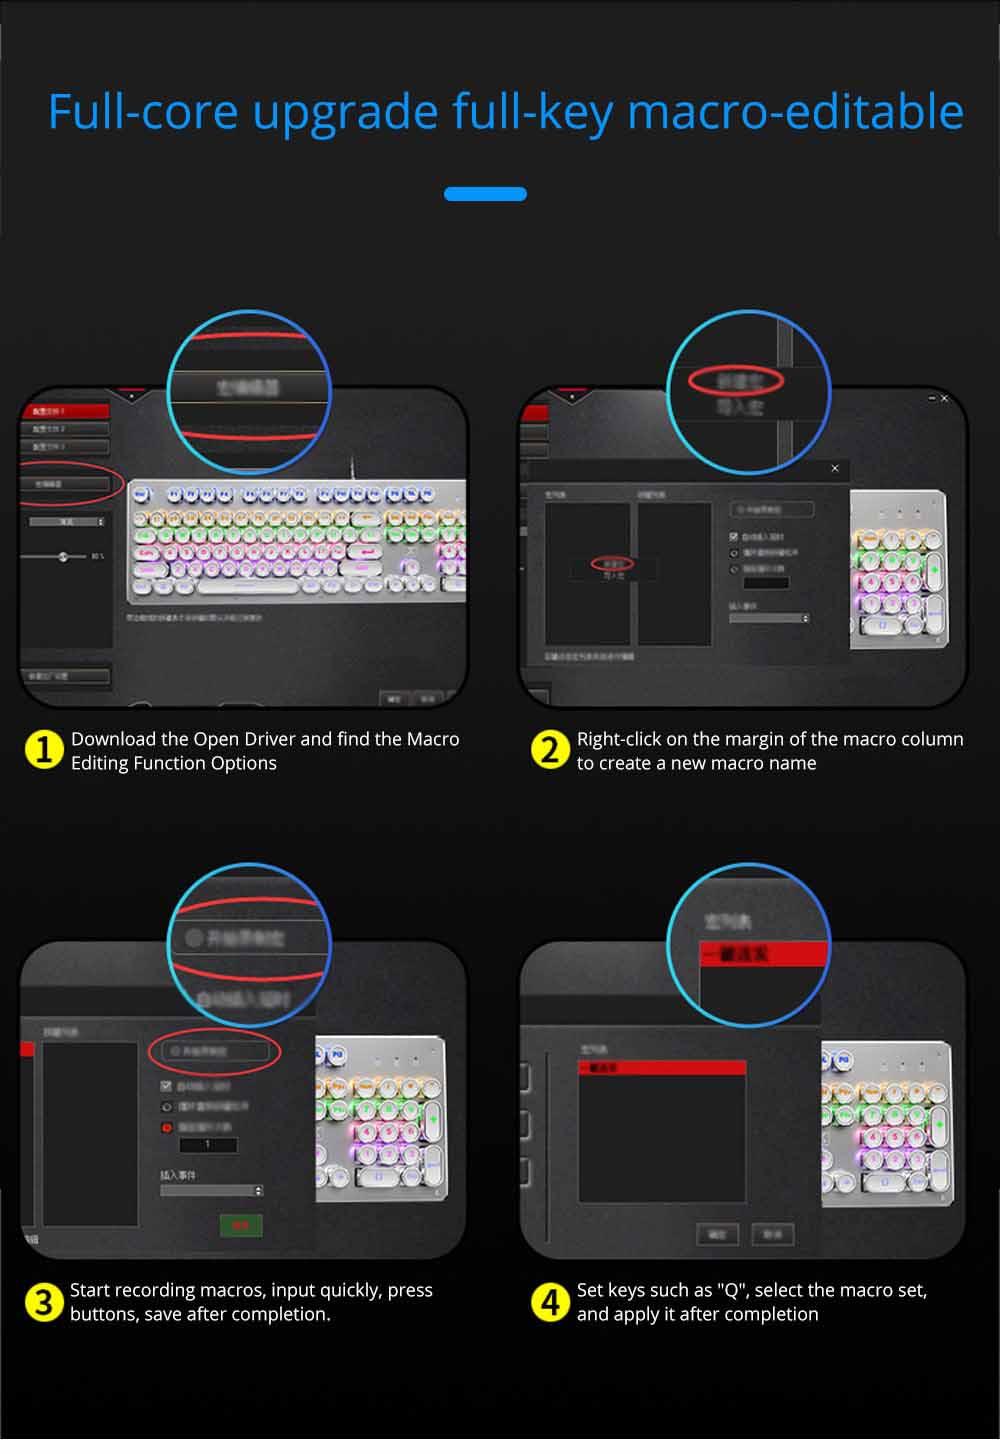 Steam Punk Keyboard Real Mechanical Keyboard Internet Bar Game Keyboard 8